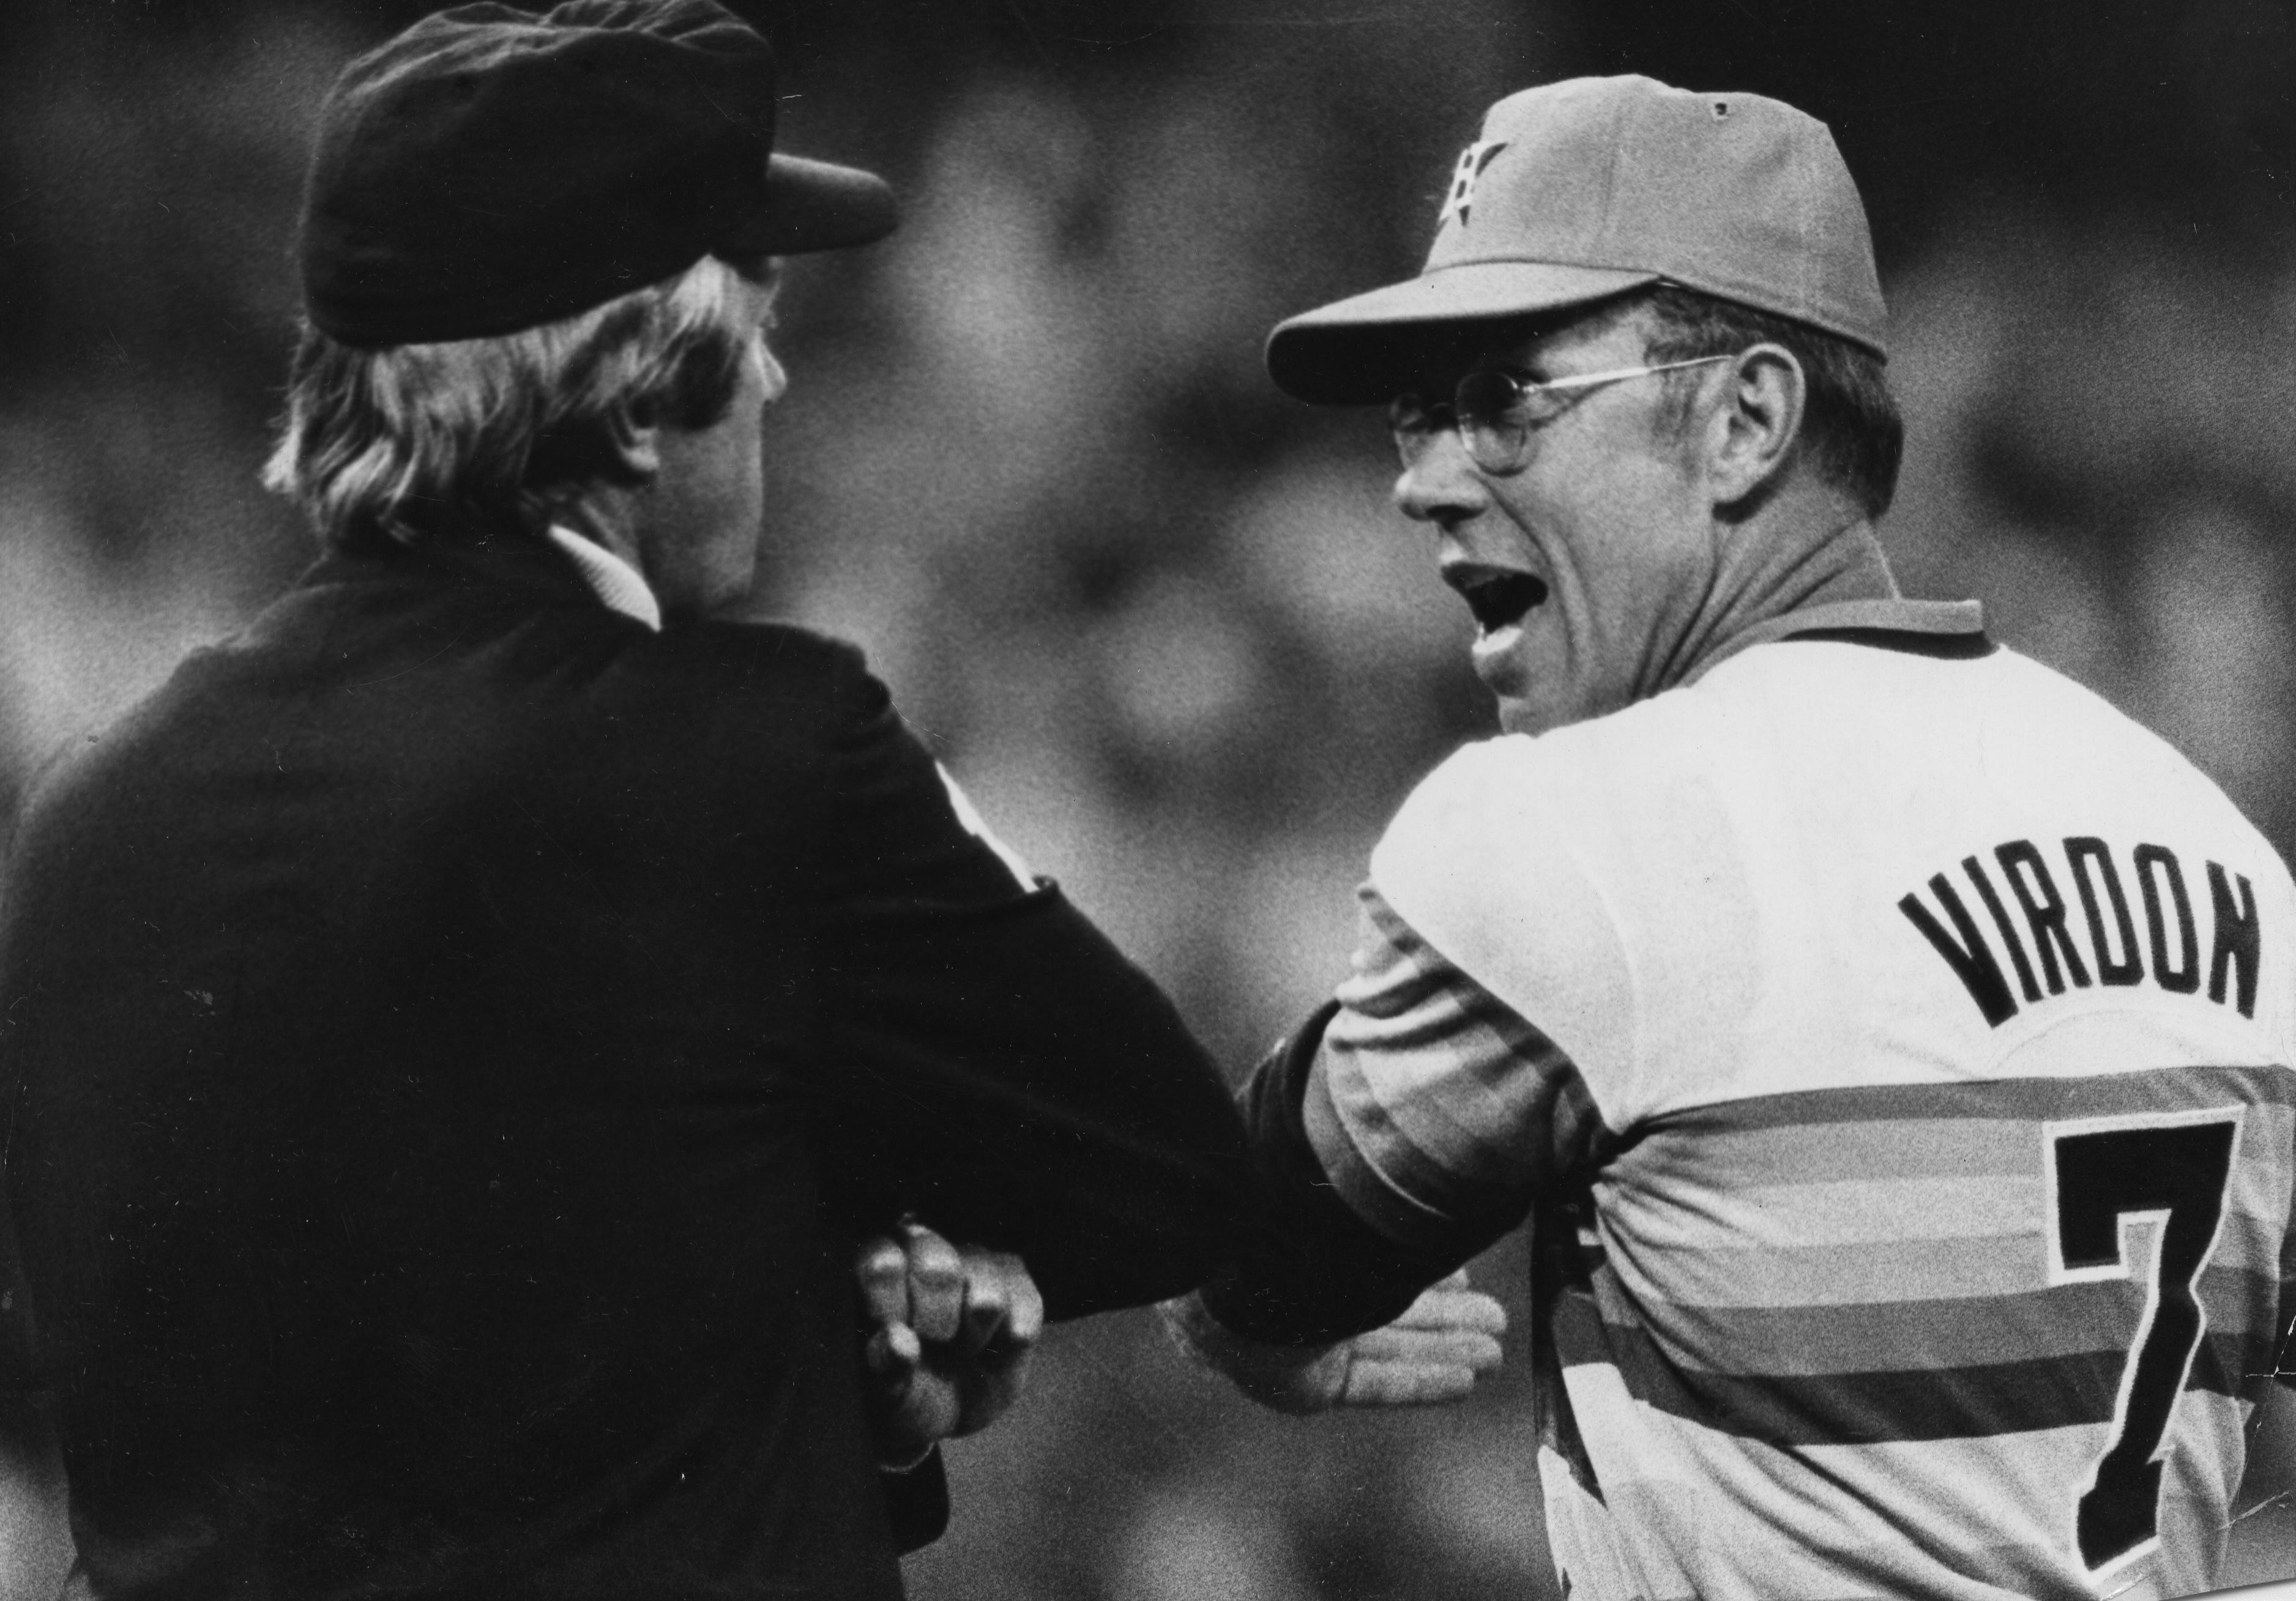 Bill Virdon has a spirited conversation on the diamond while coaching the Houston Astros.